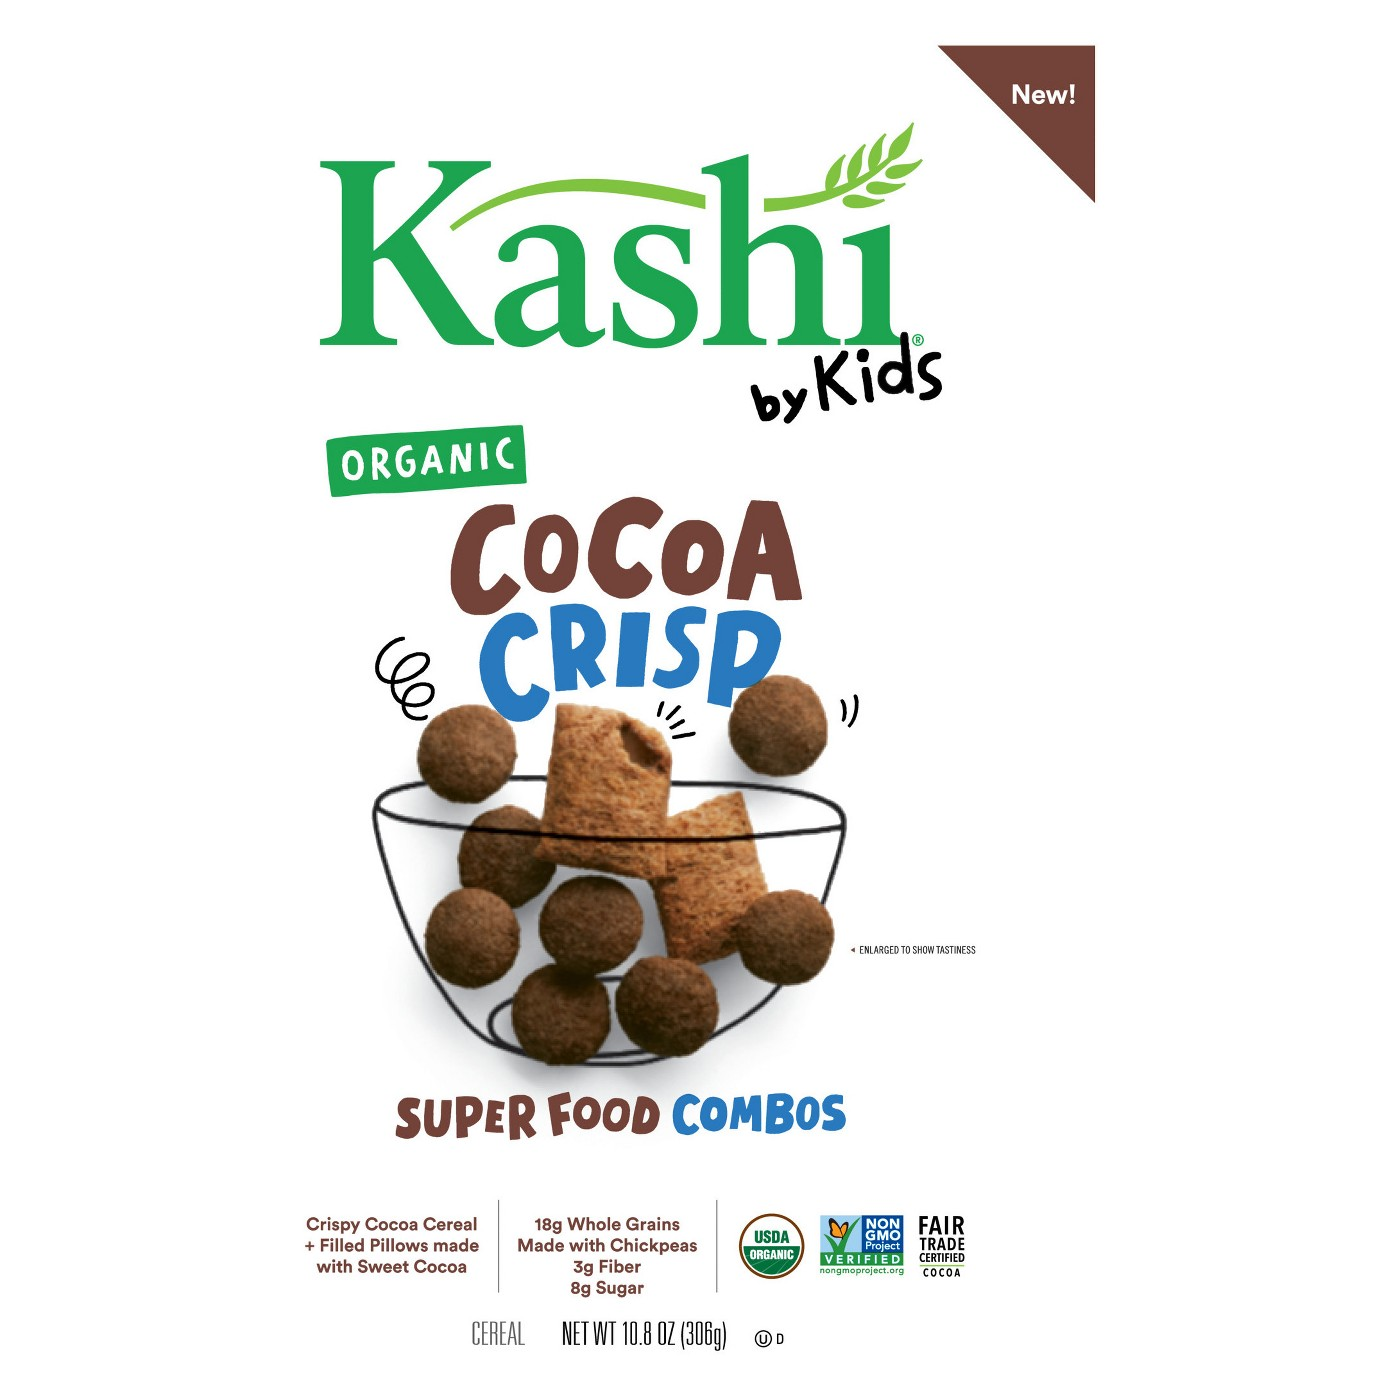 Kashi by Kids Organic Cocoa Crisp Cereal - 10.8oz - image 1 of 2